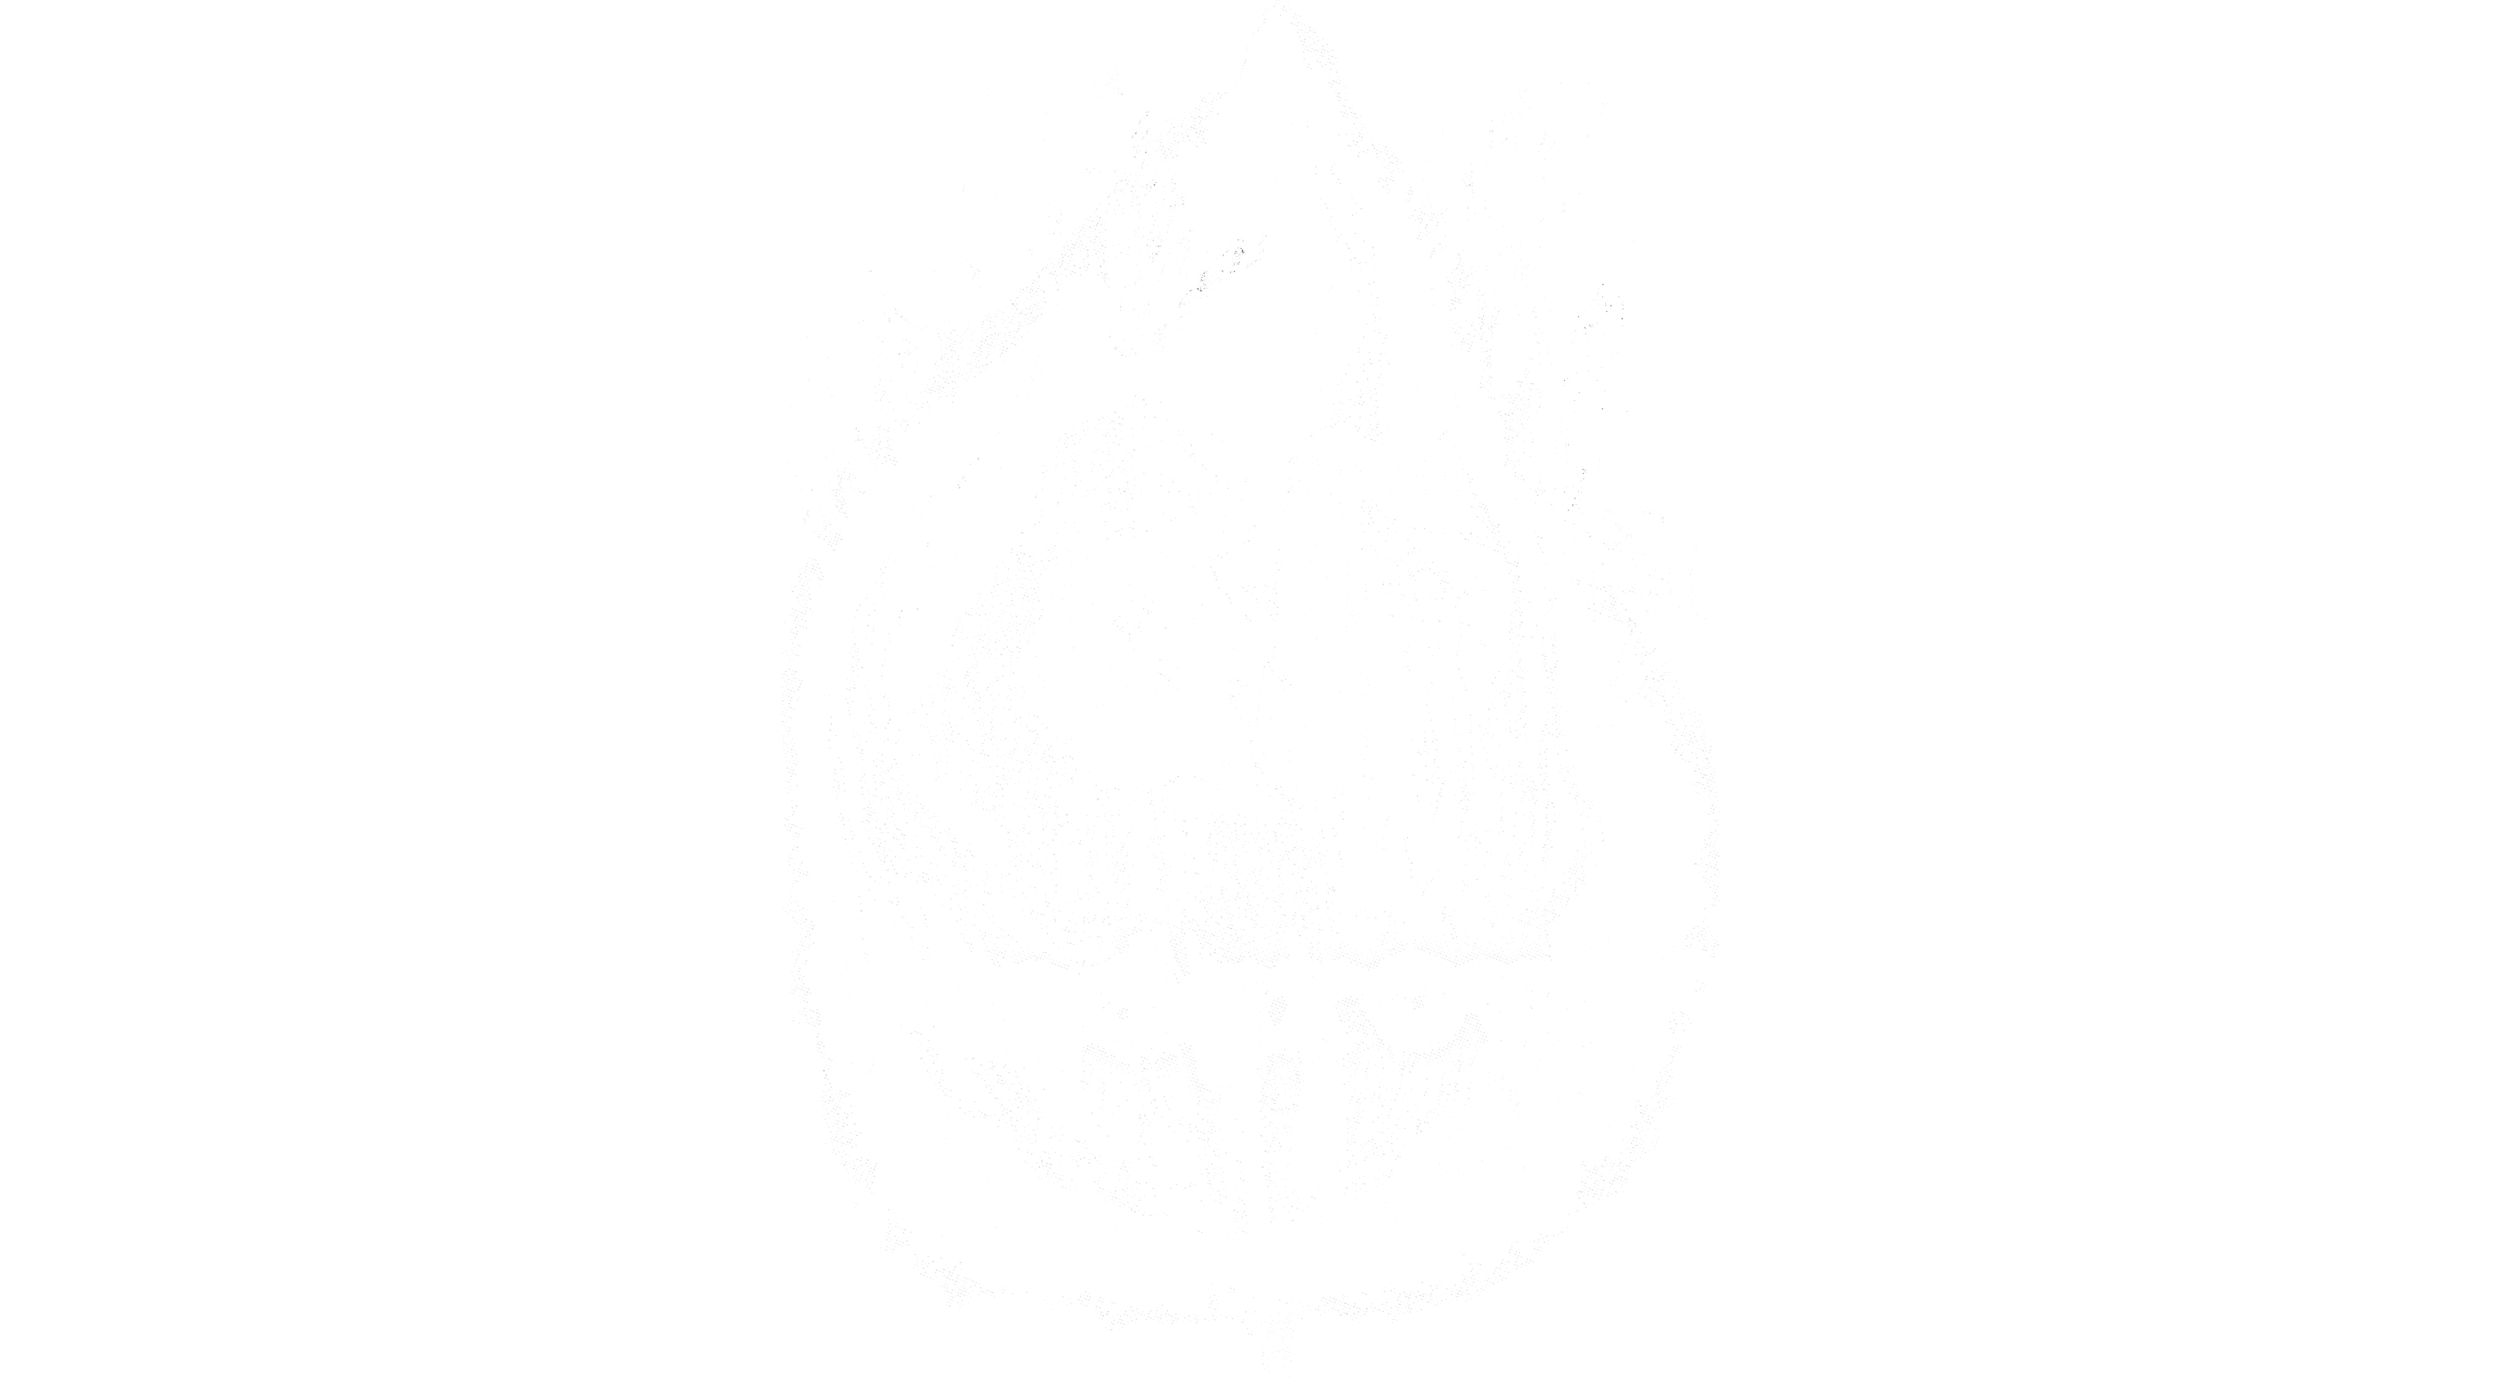 Woodgrove Sleeper - WHITE EMPTY2.png